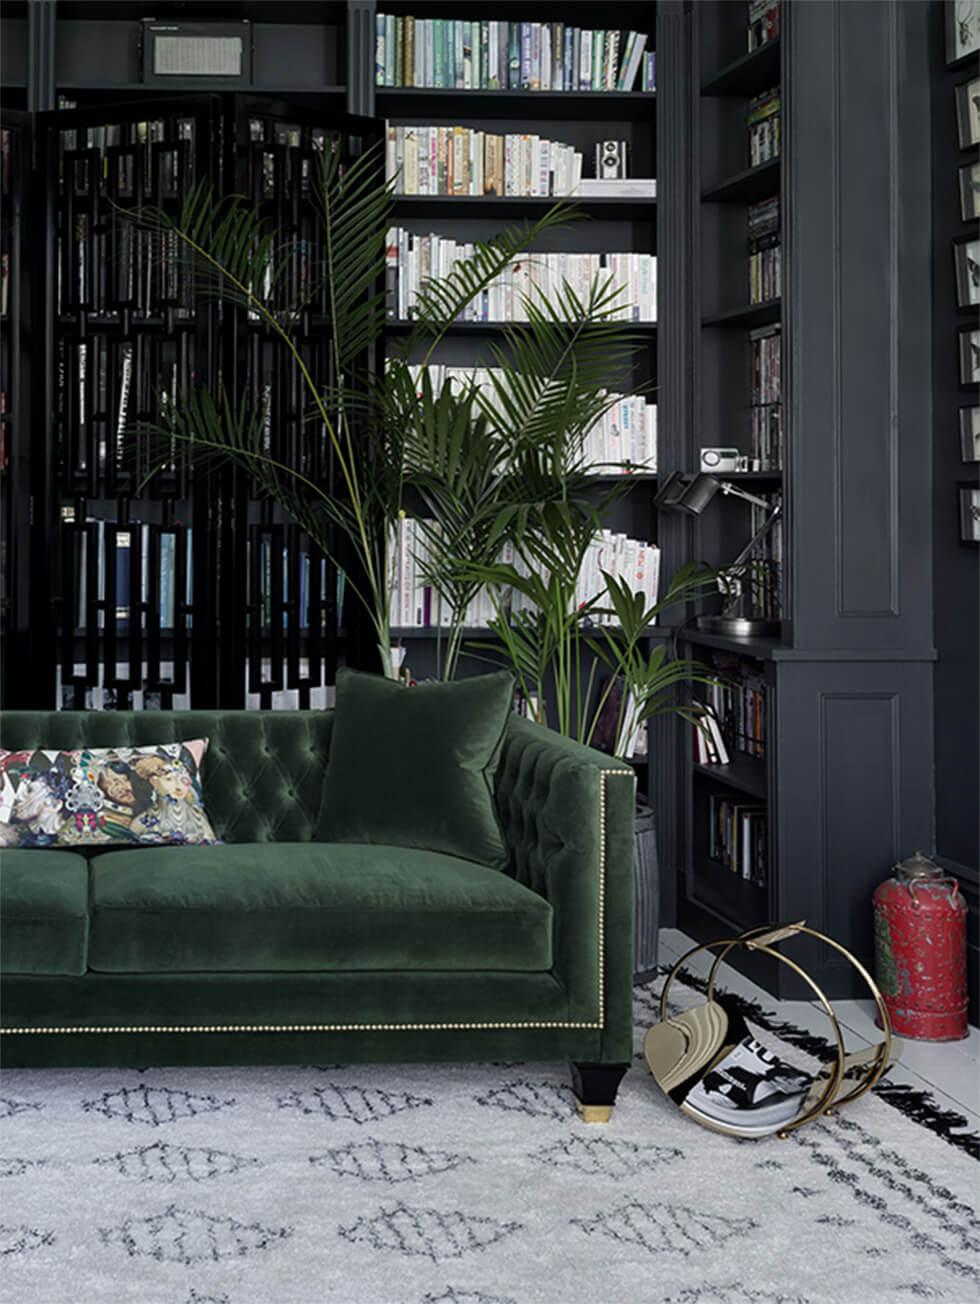 Moody, elegant dark green living room with green velvet Chesterfield sofa and grey walls